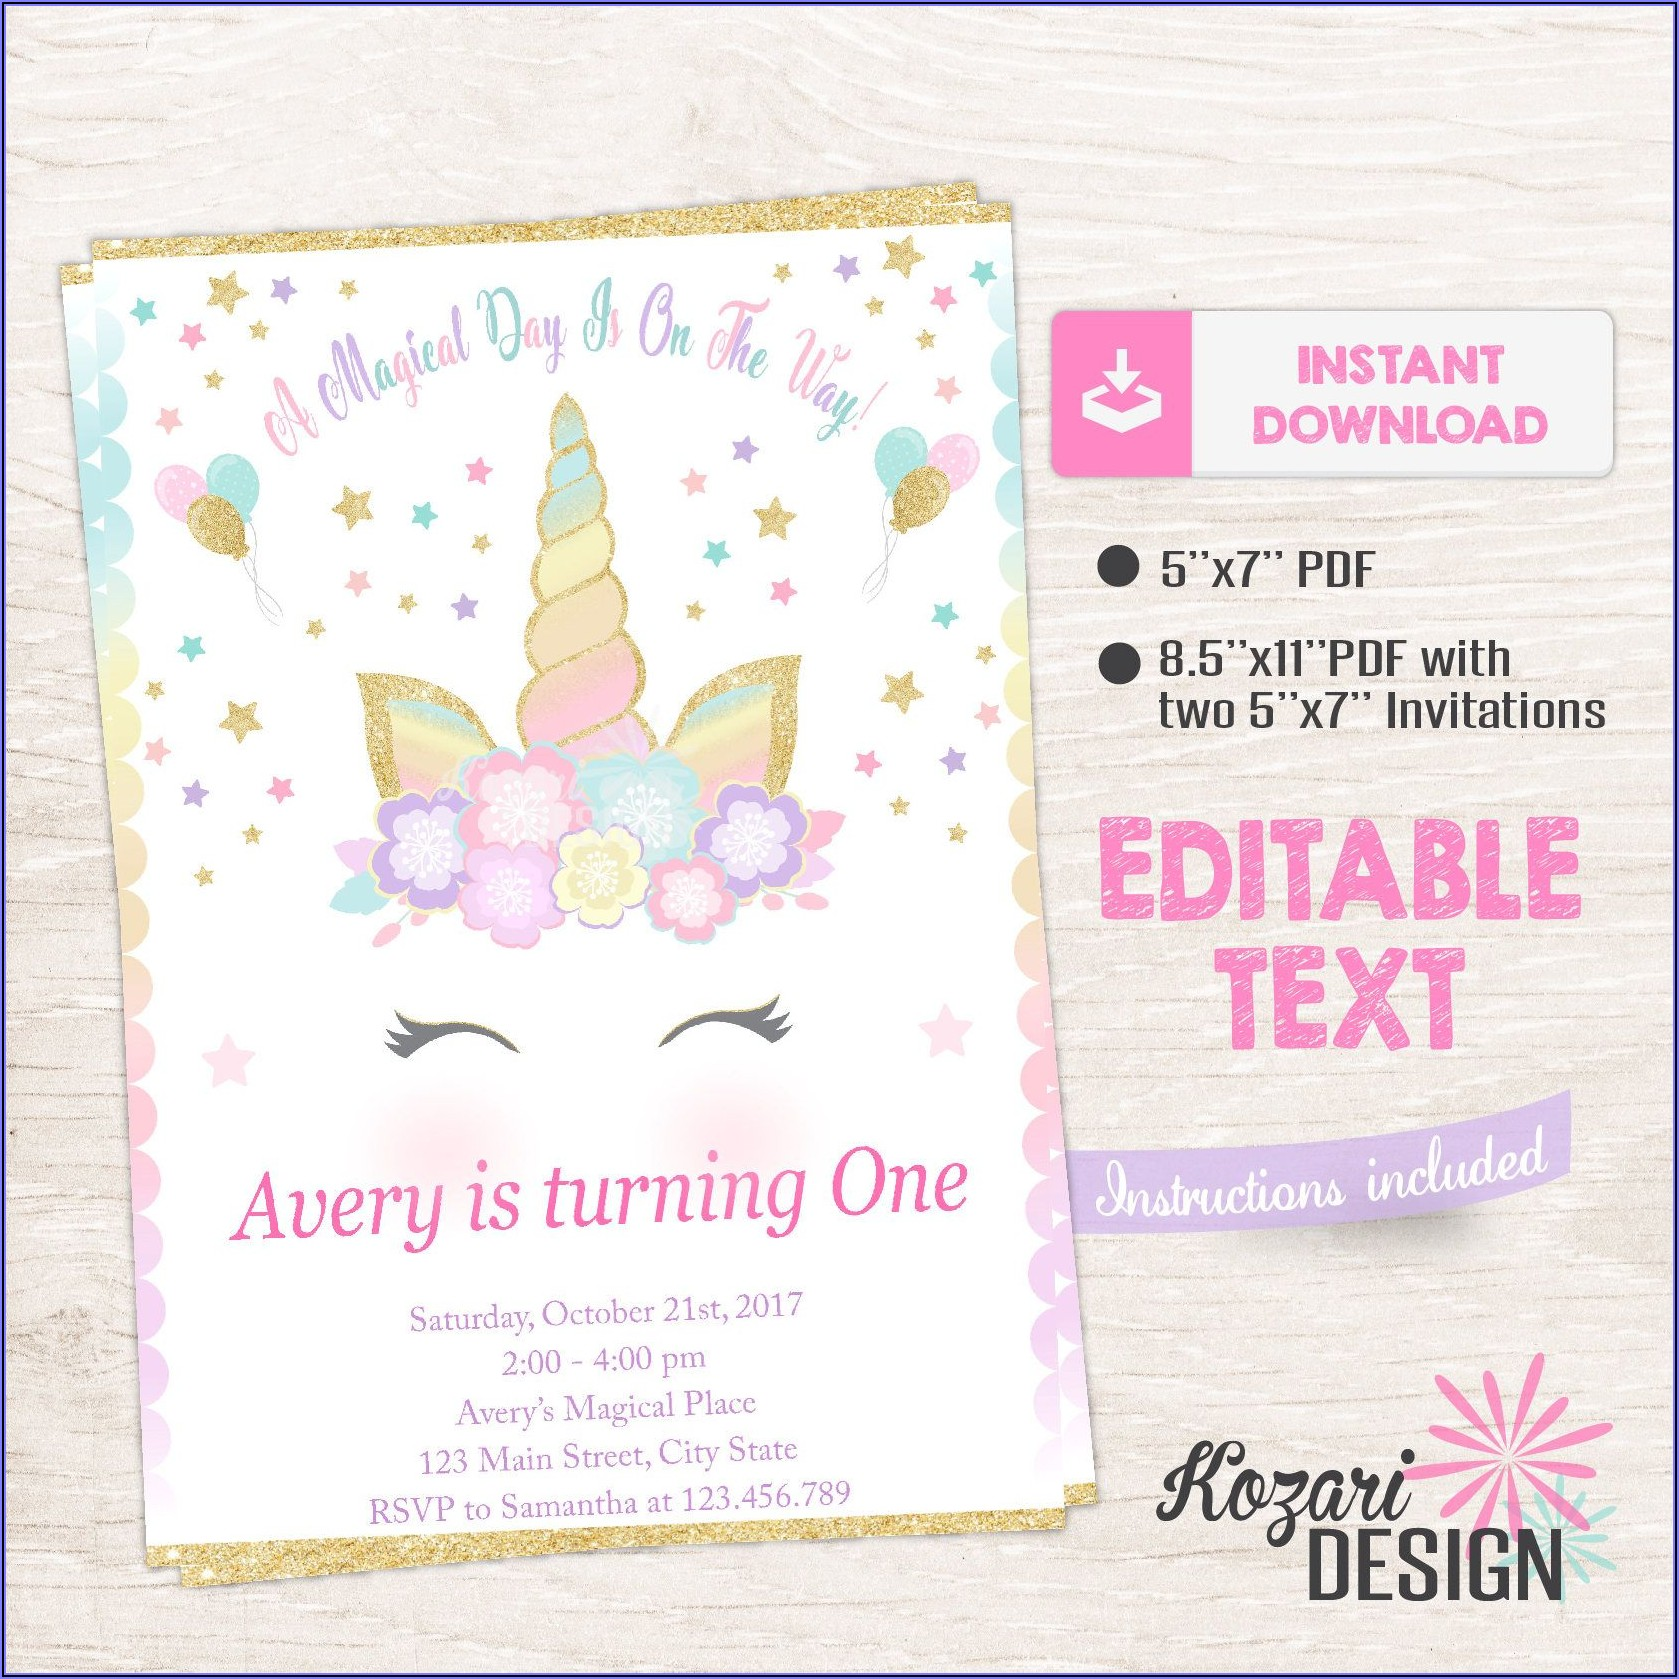 Girl Printable Editable Unicorn Birthday Invitations Templates Free